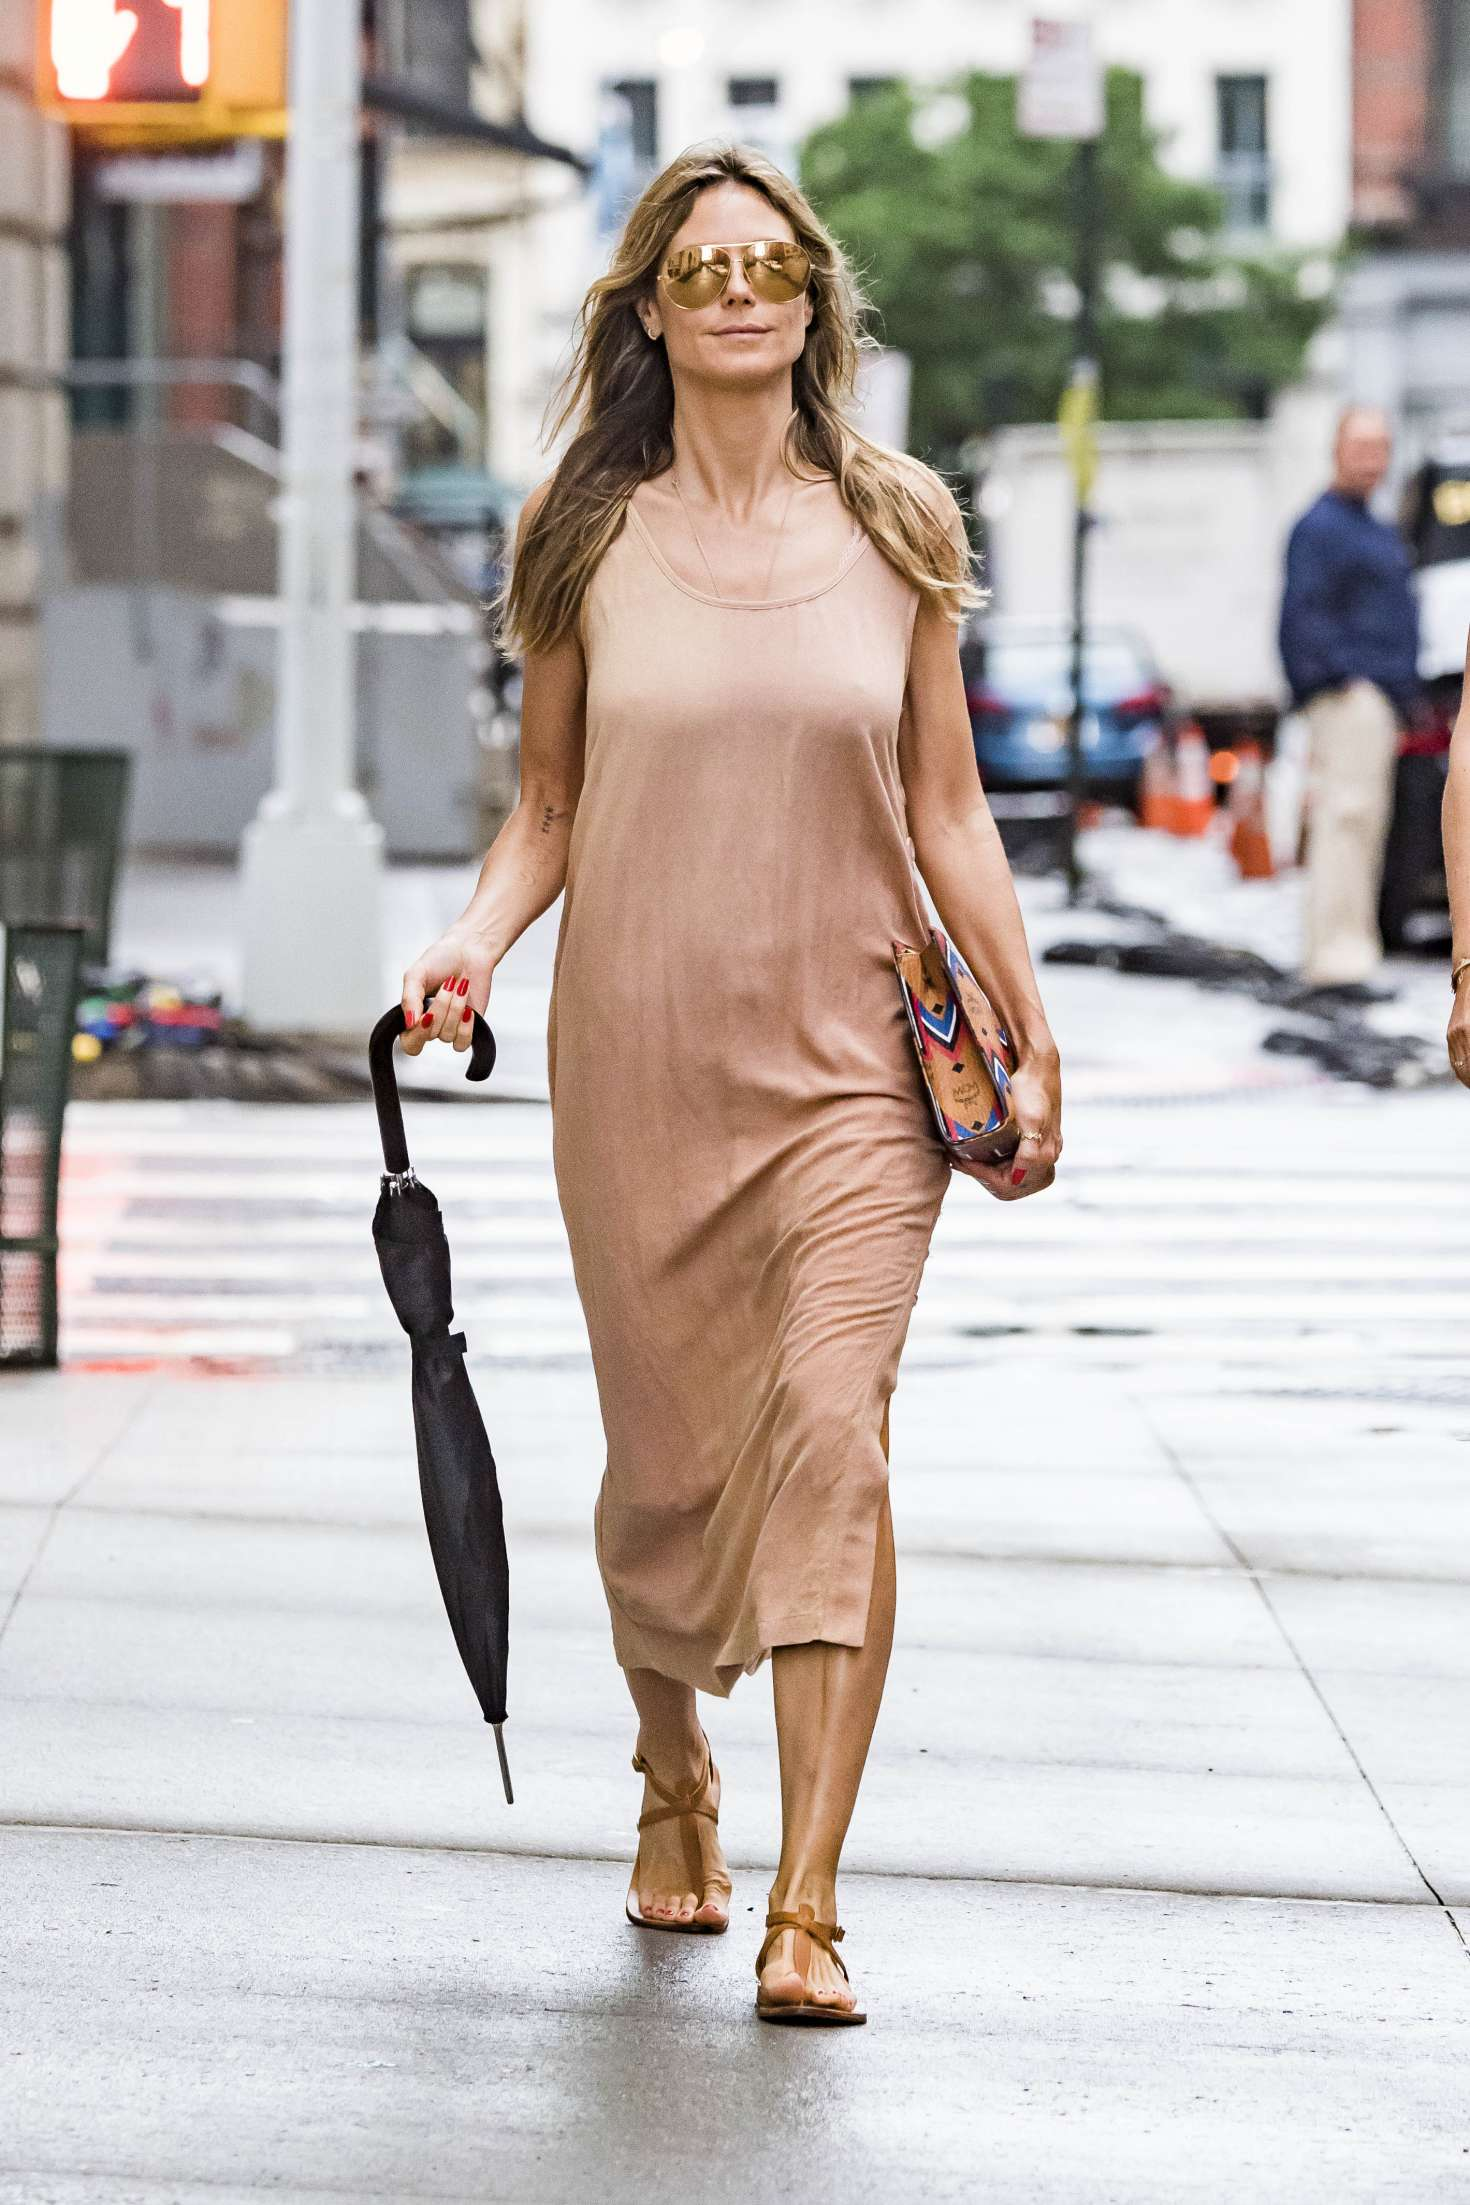 Feet Yasmine Latiffe nude (24 foto and video), Tits, Leaked, Instagram, braless 2019